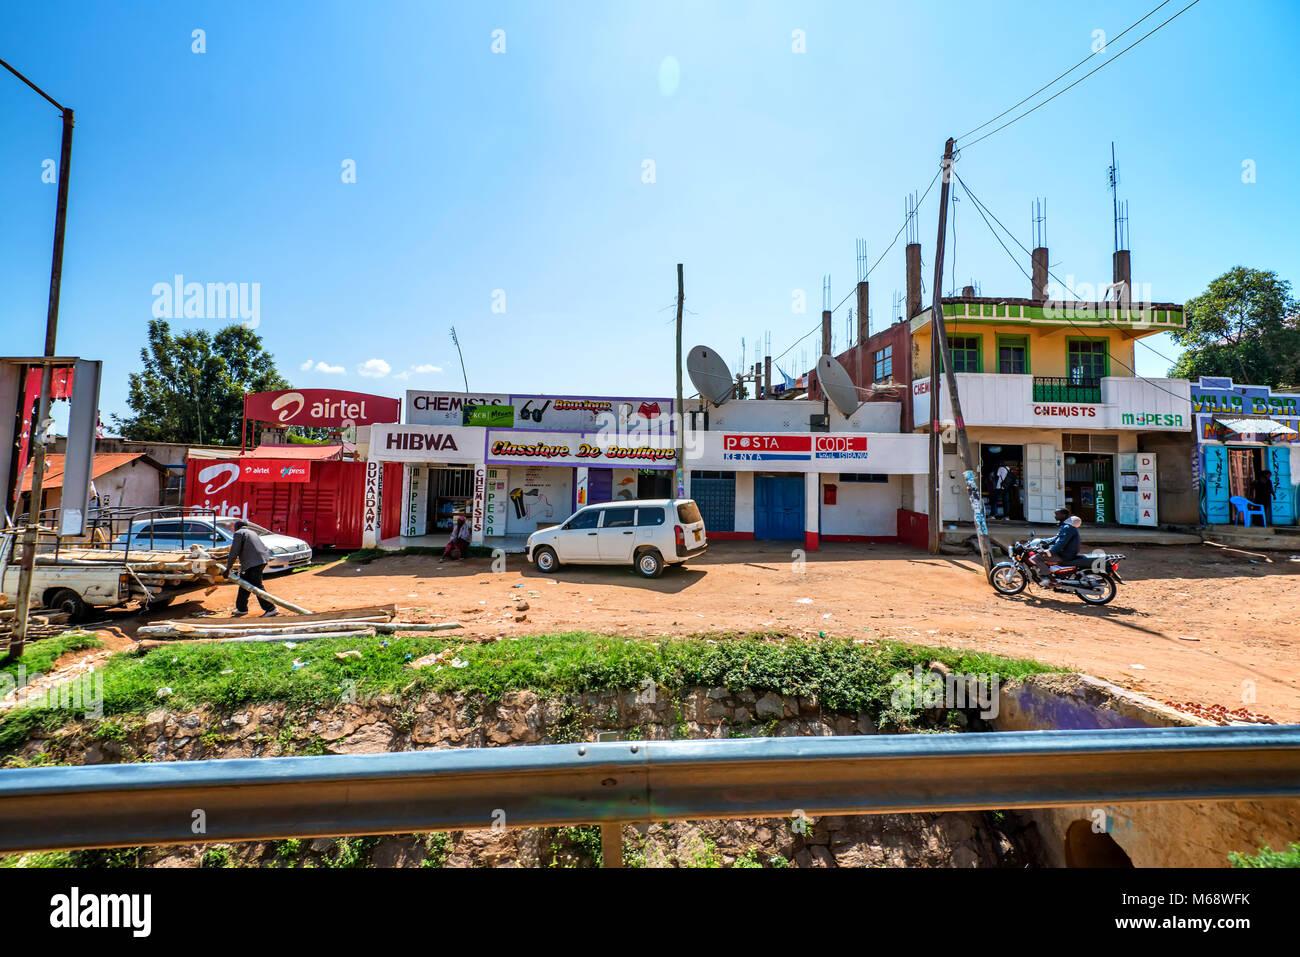 ISEBANIA, KENYA -JANUARY 3, 2015: View of Isebania street Stock Photo